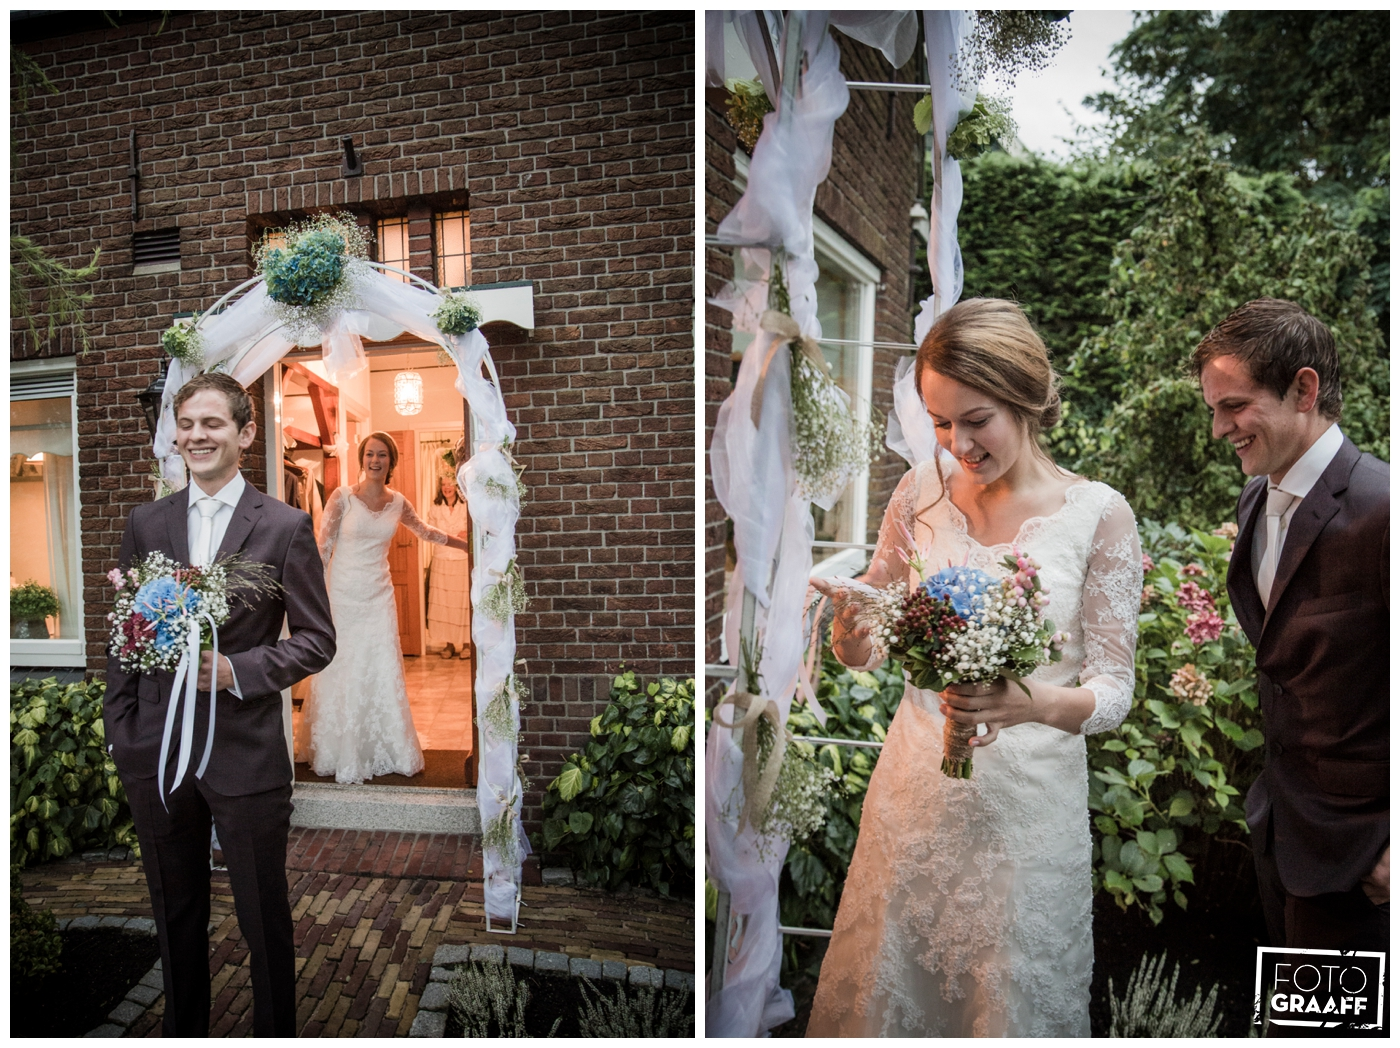 bruidsfotografie in het Koetshuis Keesjan & Debora_1510